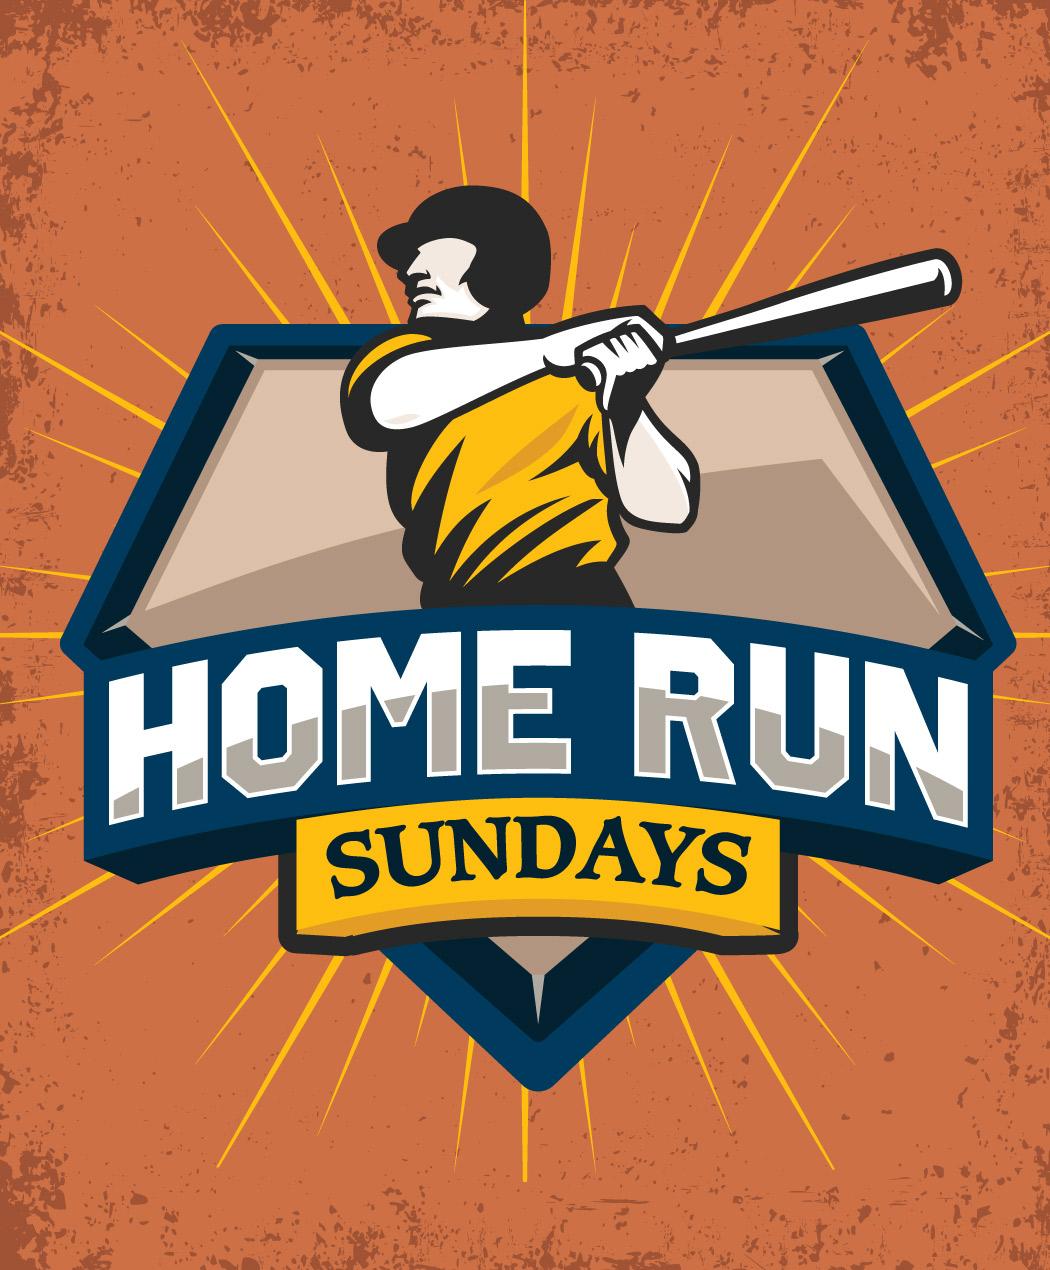 Home Run Sundays